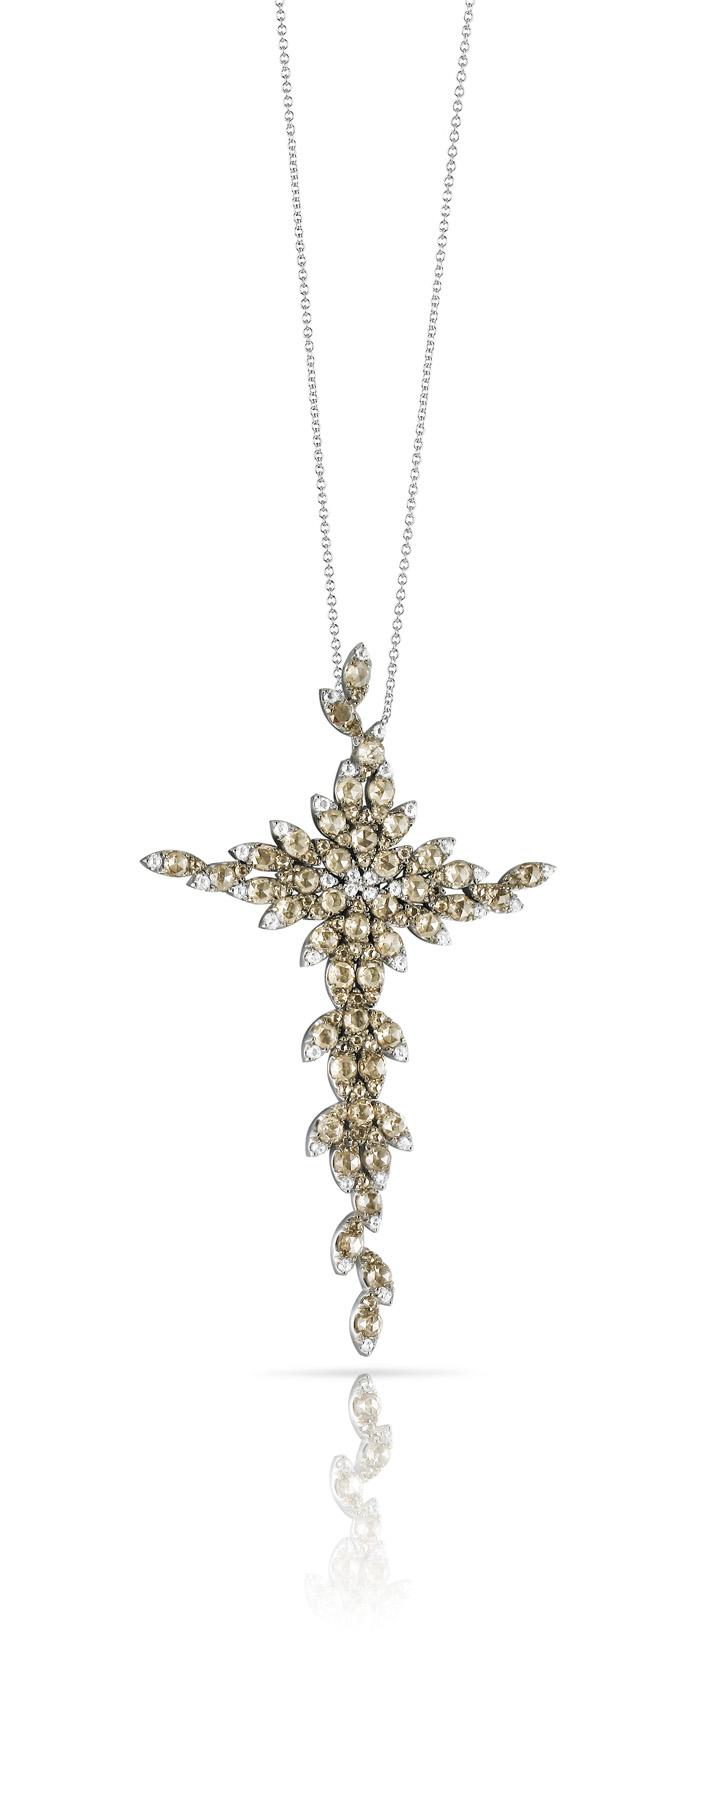 RoseGuirlande_necklace_14597B.jpg